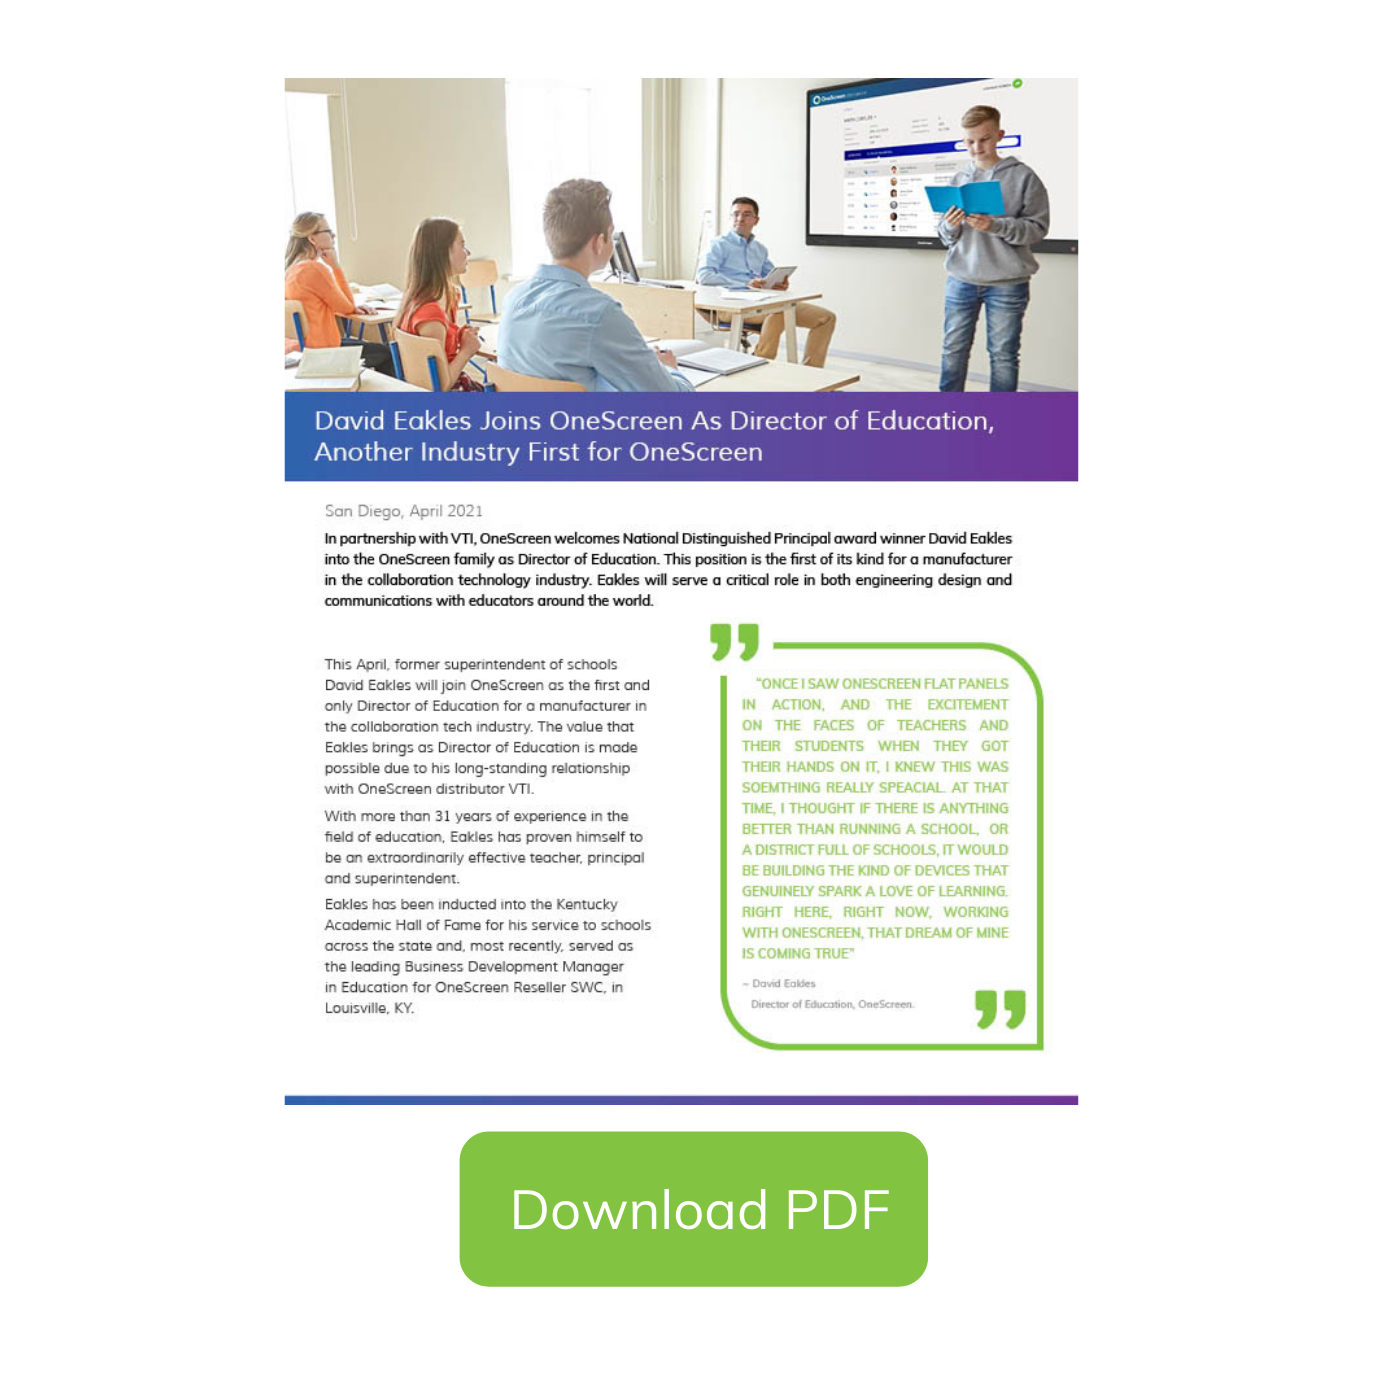 Download PDF(2)